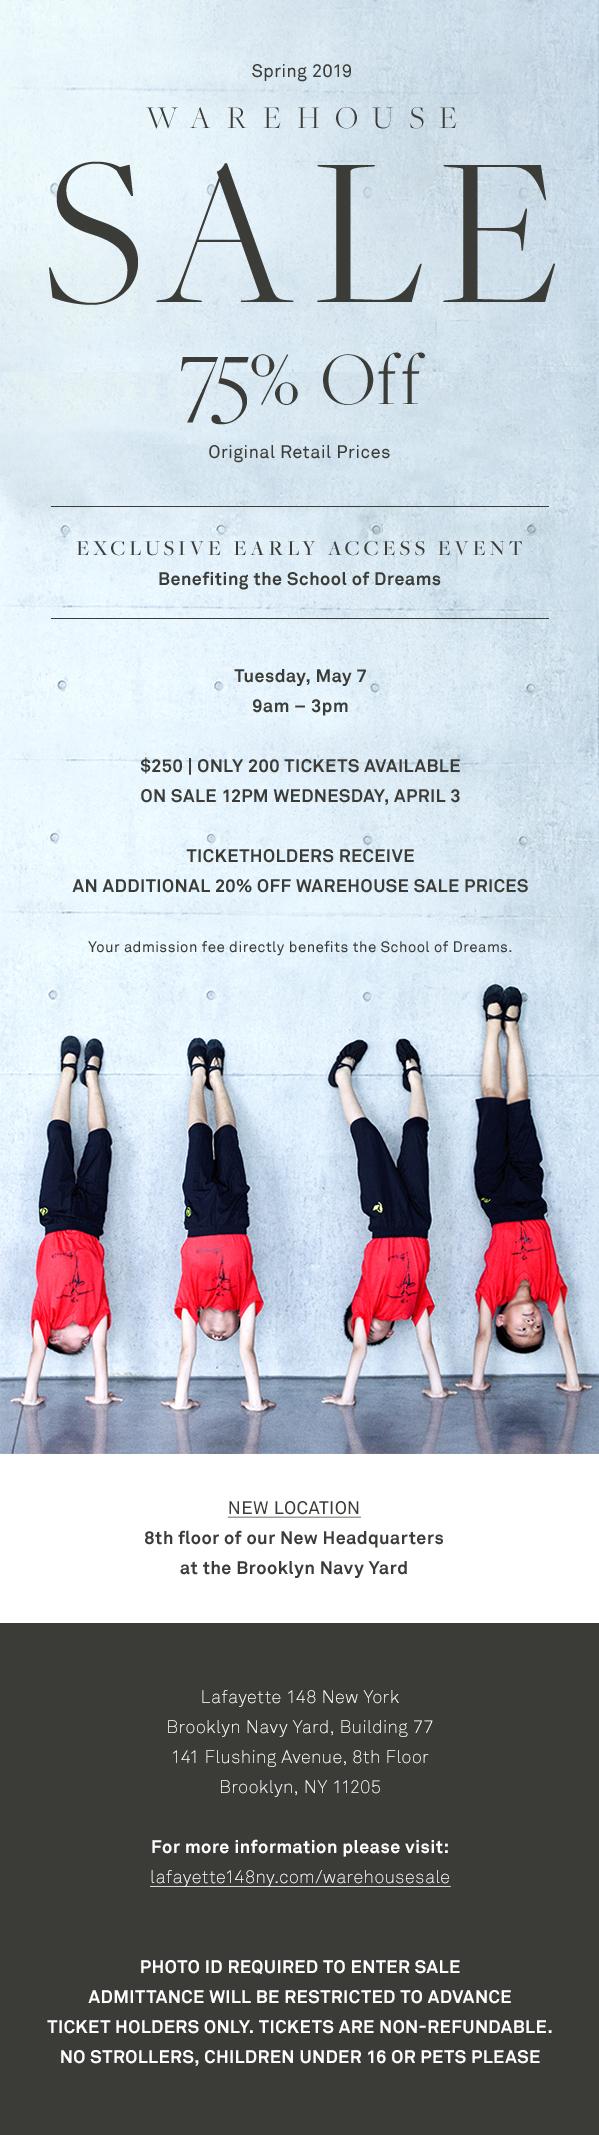 Lafayette 148 New York Warehouse Sale